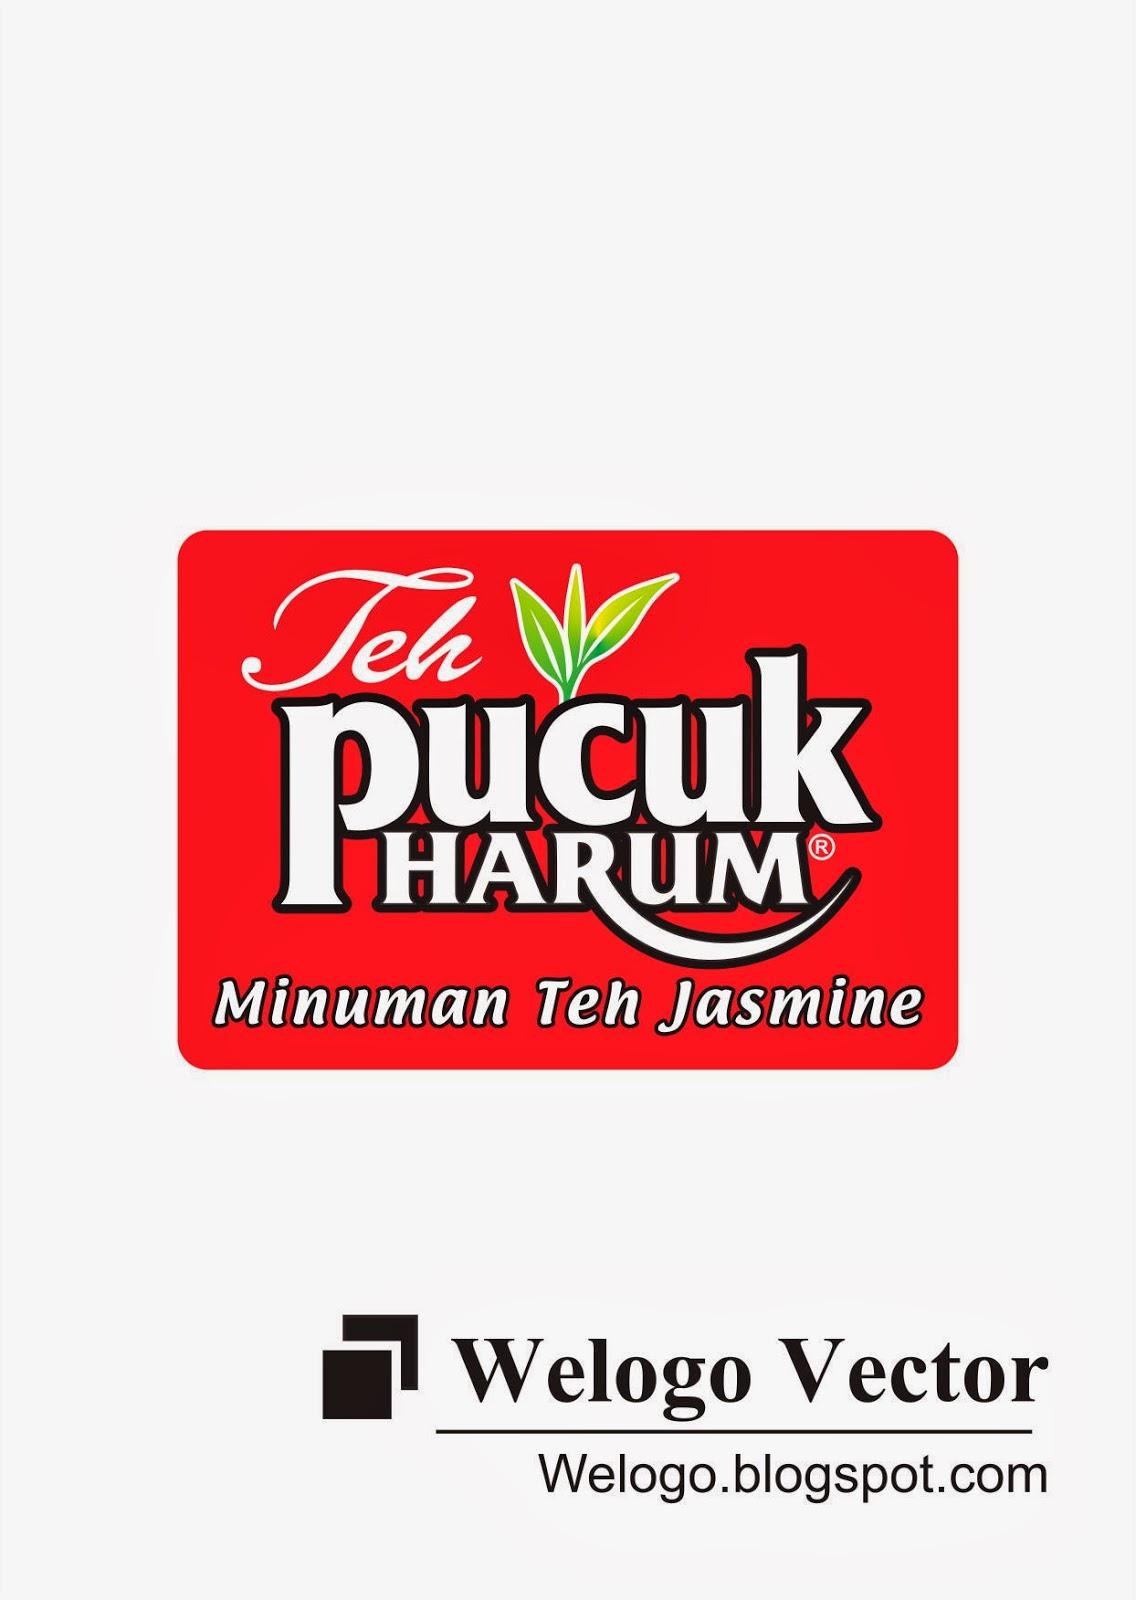 Teh Pucuk Harum Logo